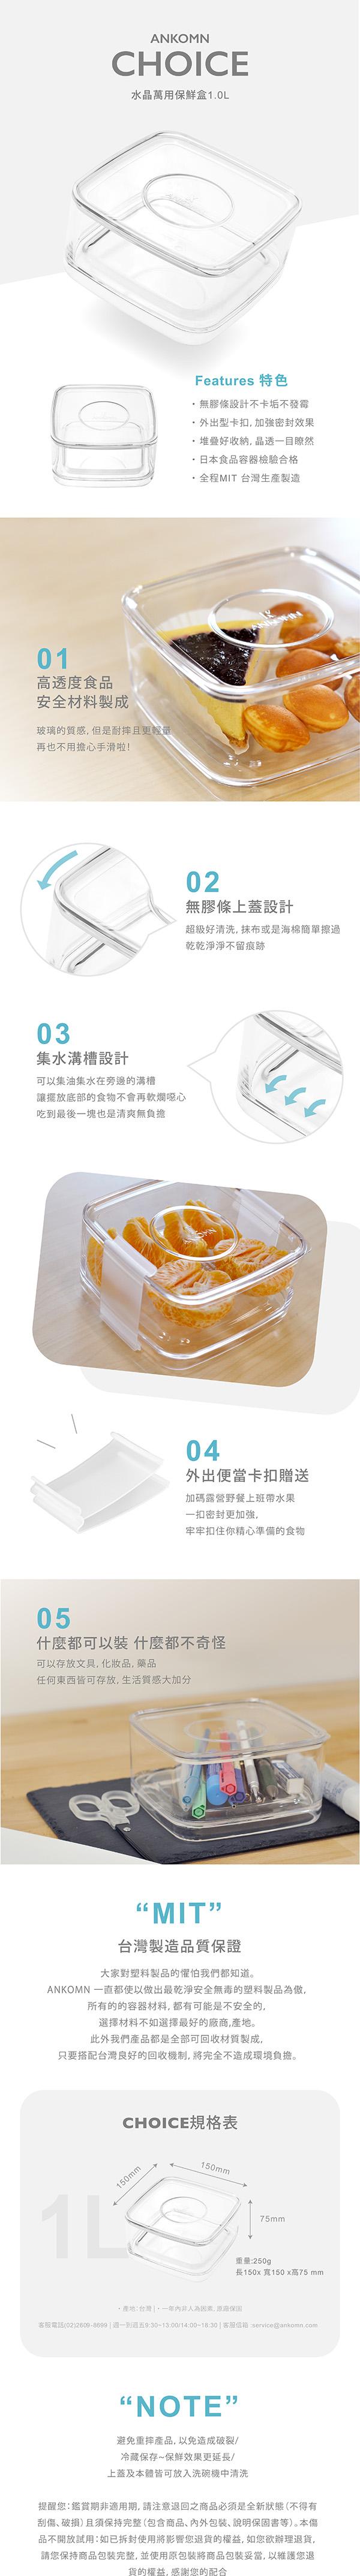 ANKOMN|CHOICE 萬用盒 1公升 (4入組)